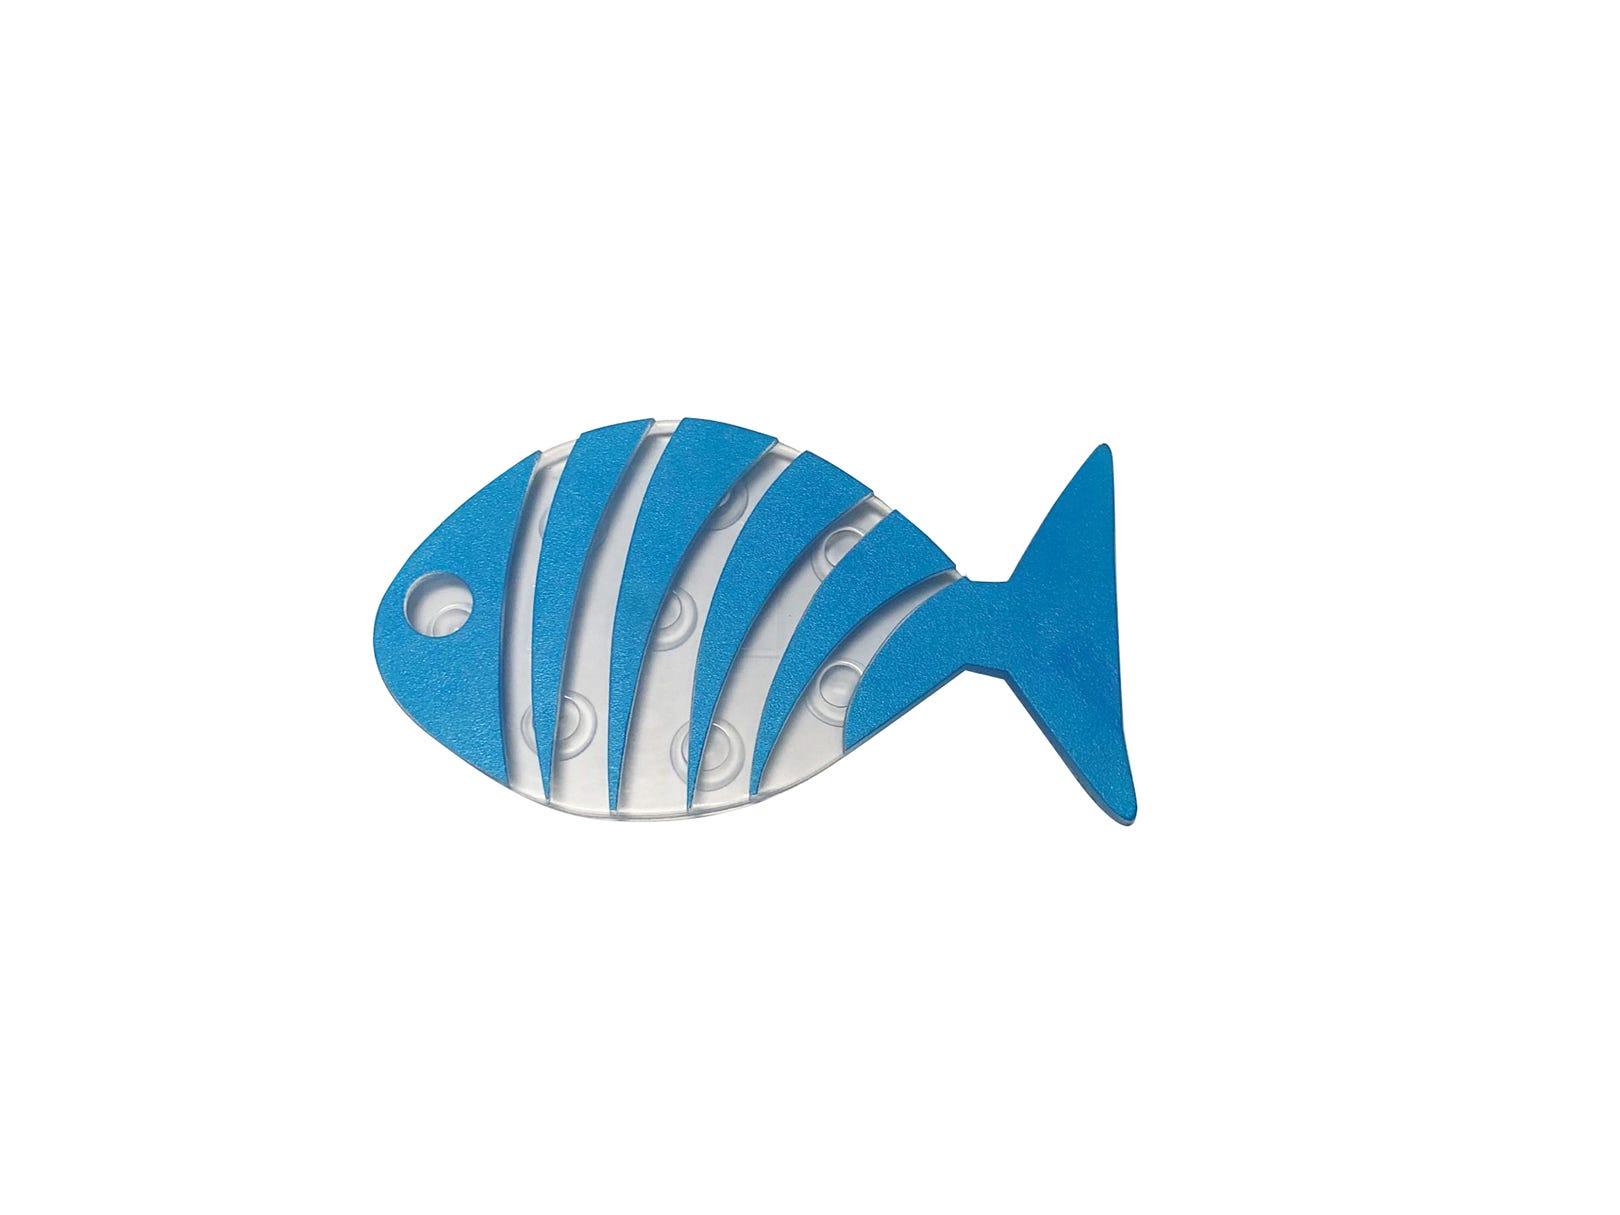 Peces antiderrapantes para regadera Namaro Design en azul, Set de 6